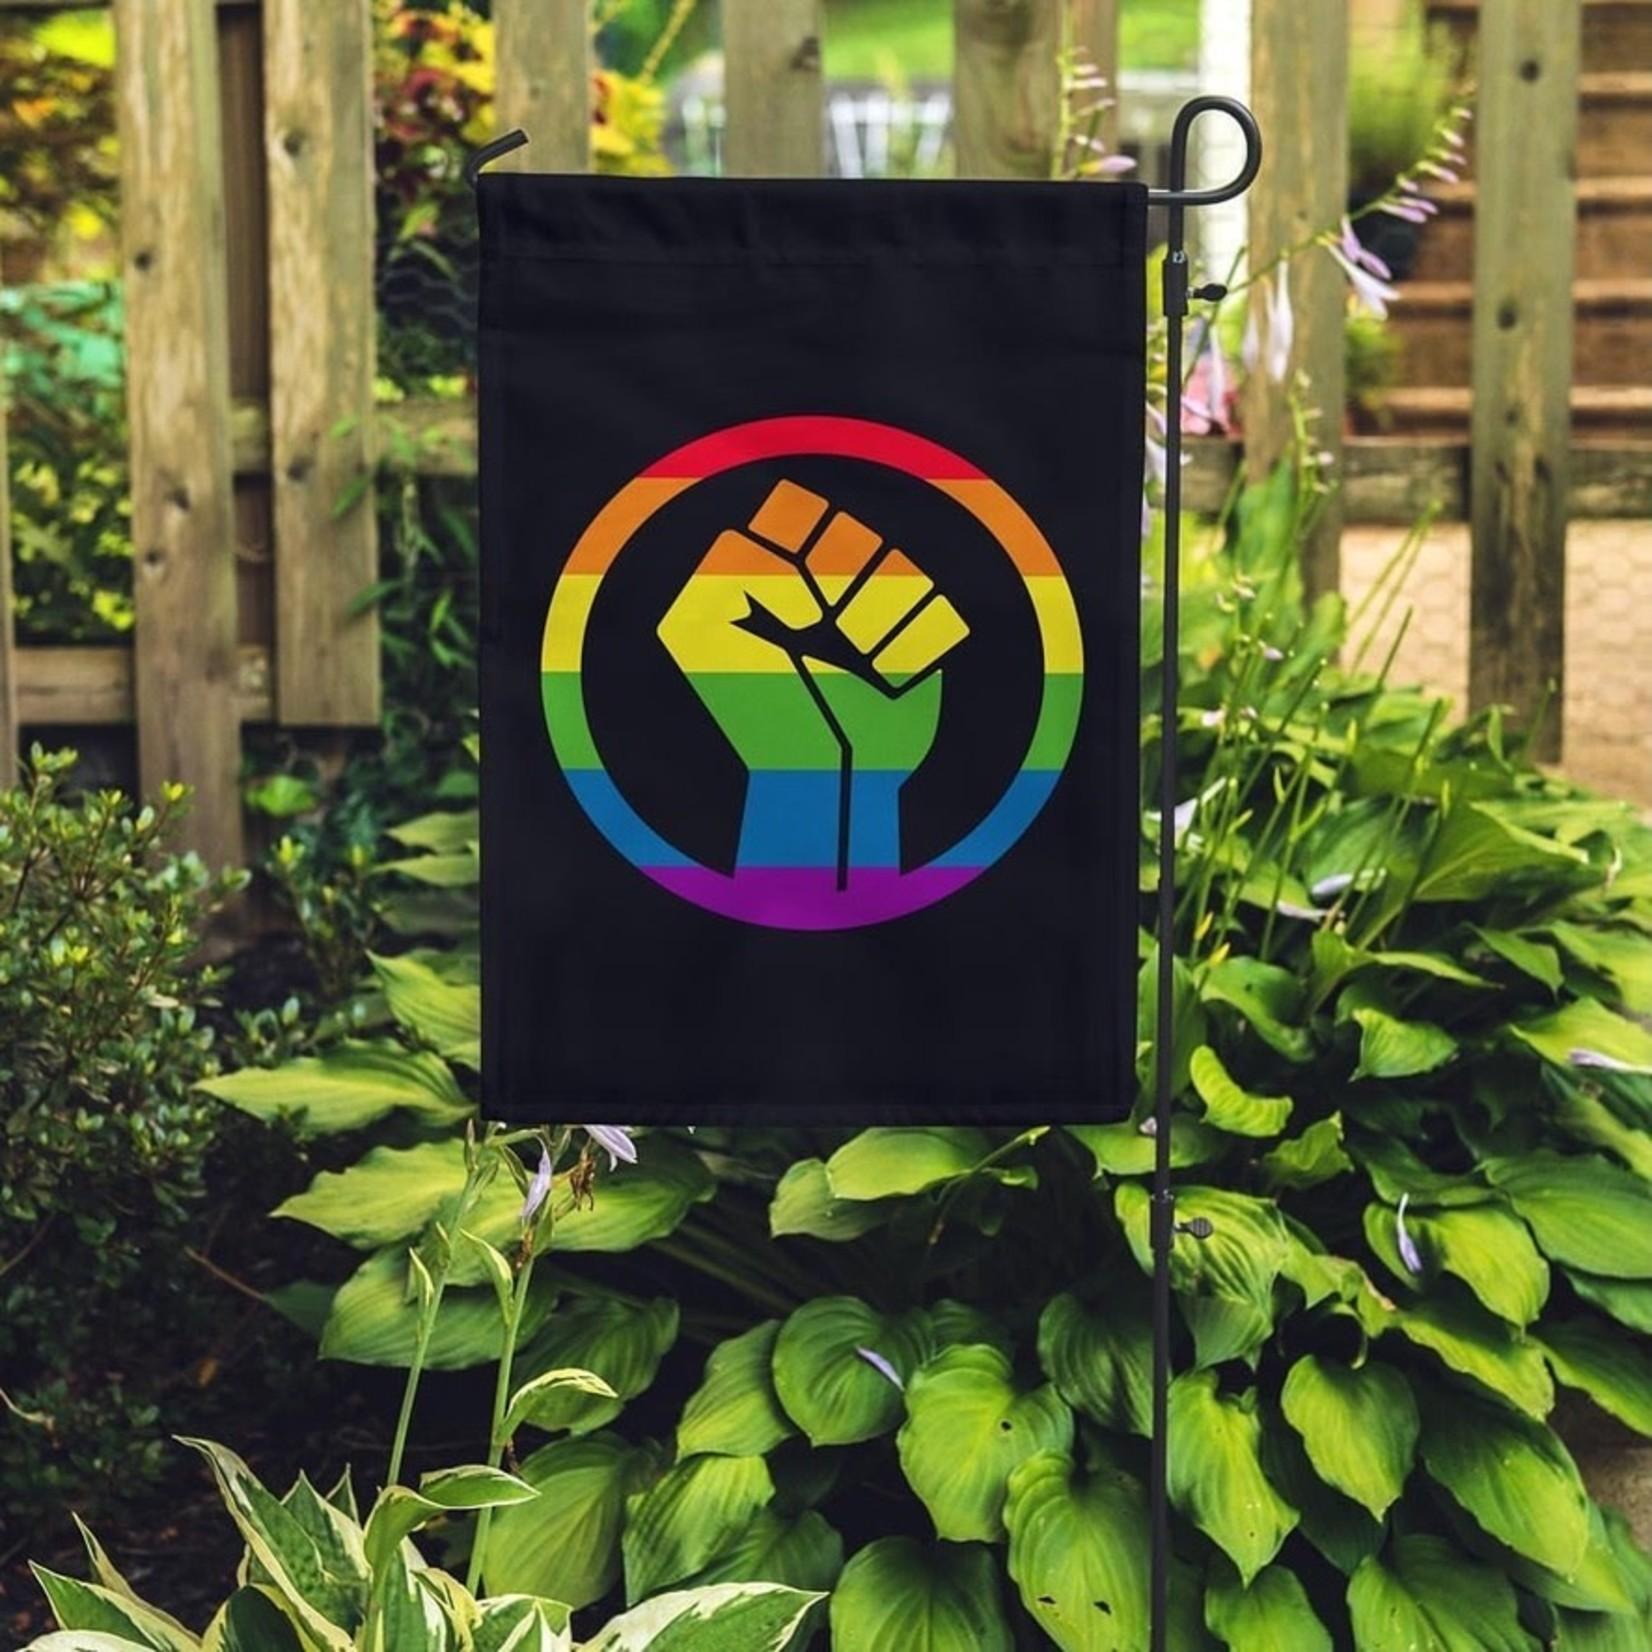 Flags for Good Garden Flag